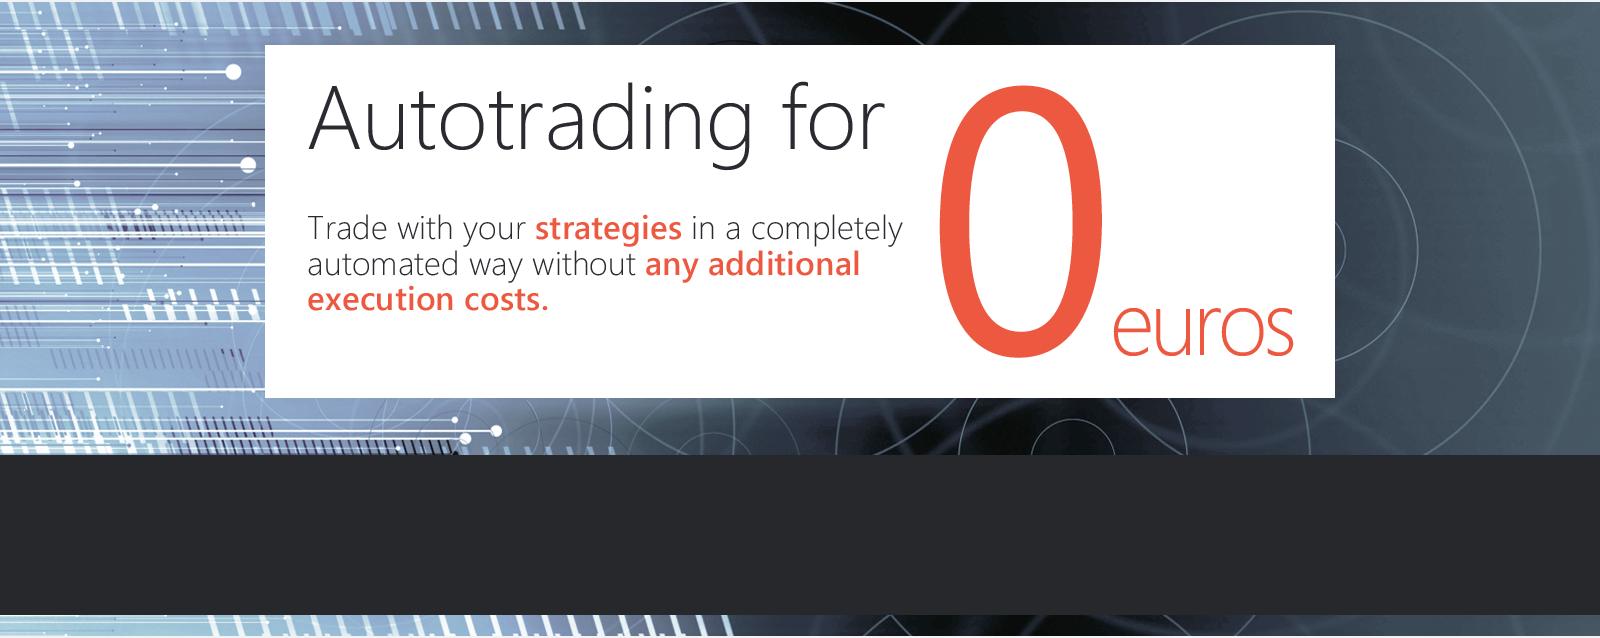 Autotrading–Configure your own strategies' portfolio